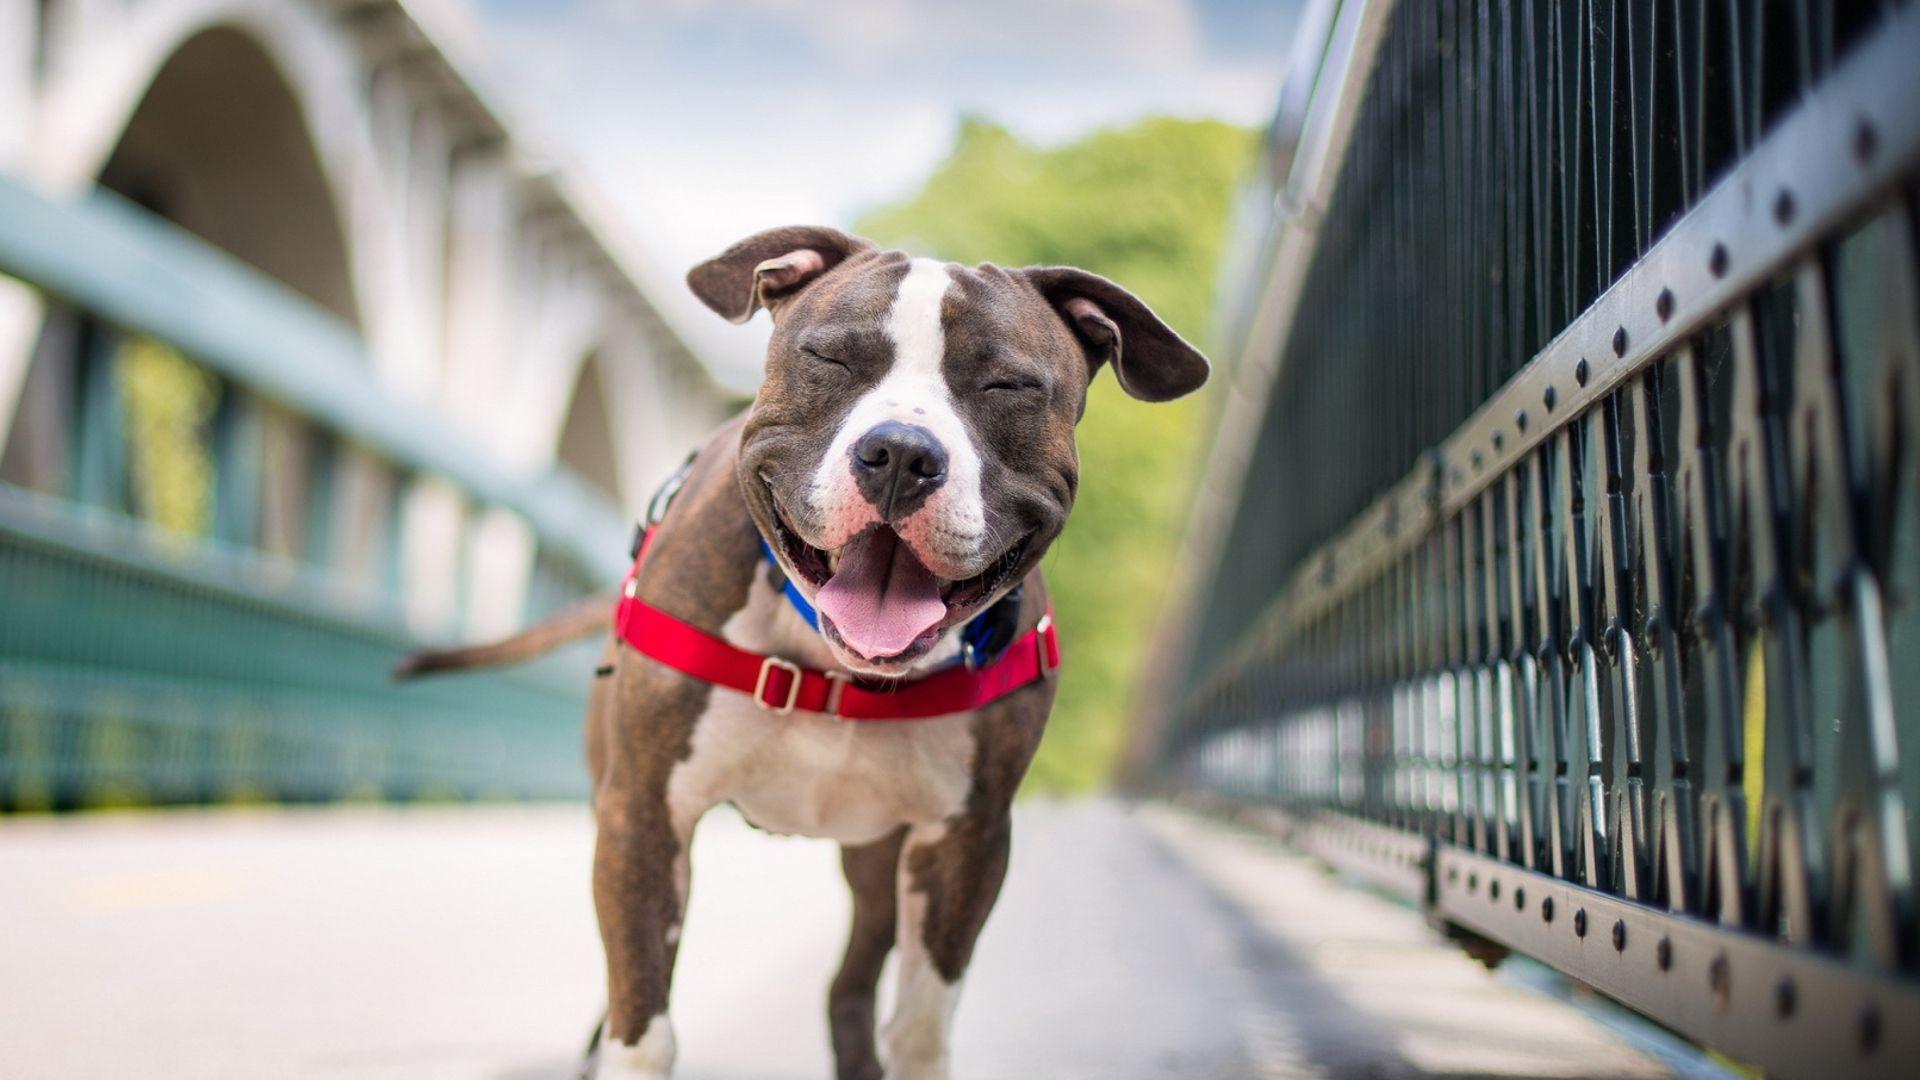 Wallpaper Staffordshire Terrier